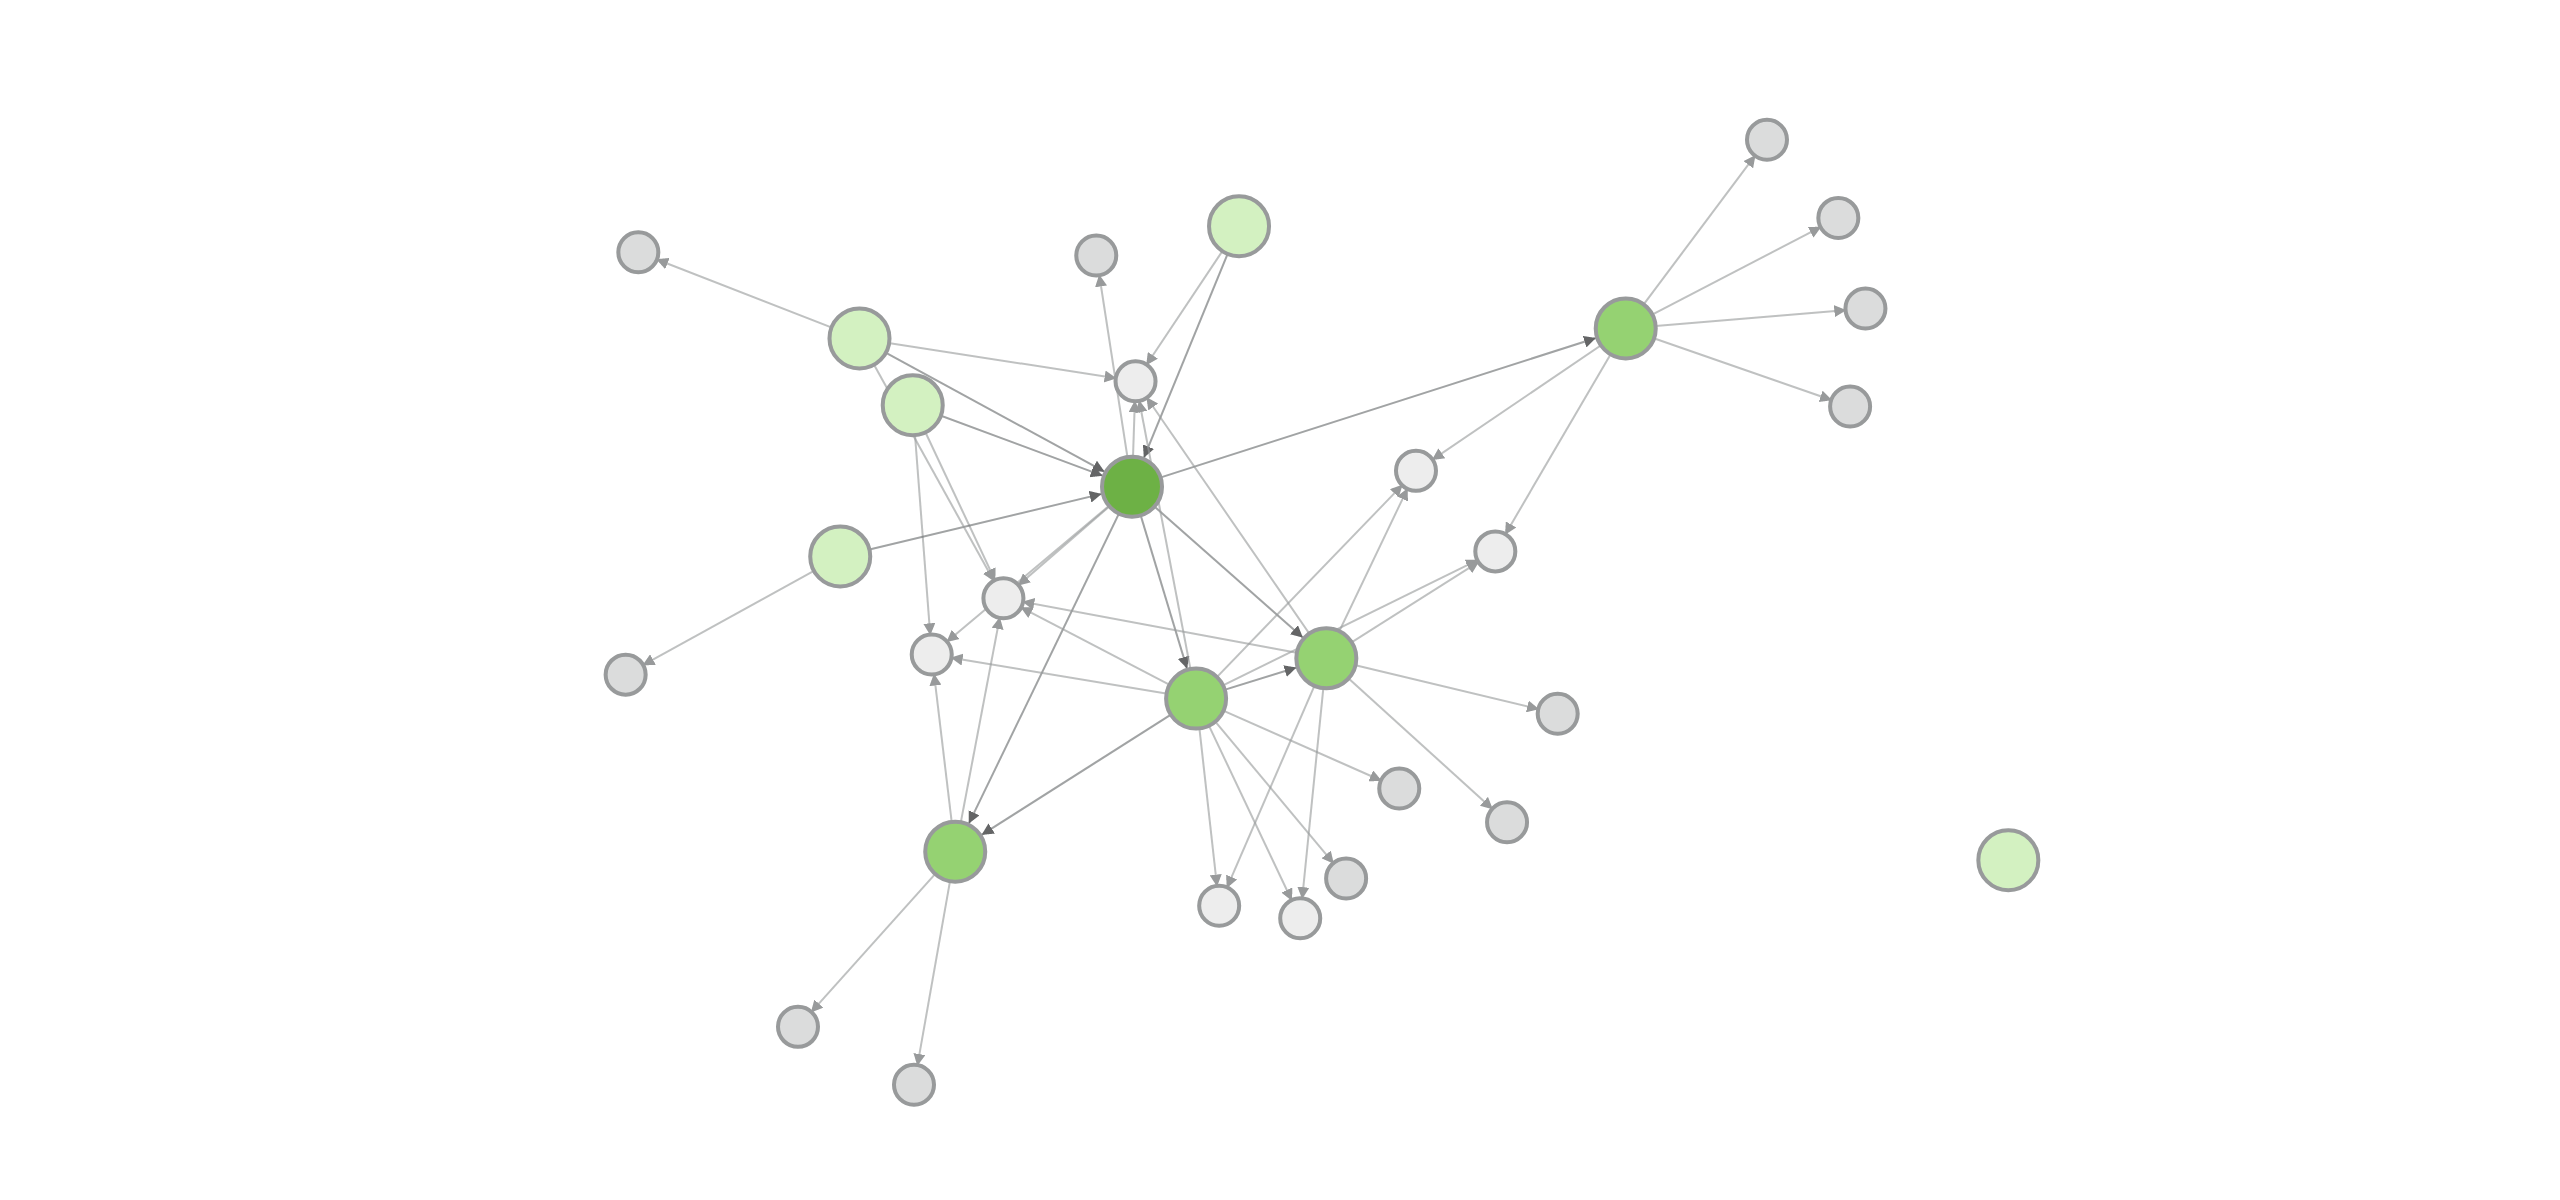 Dependencies - Components and Code